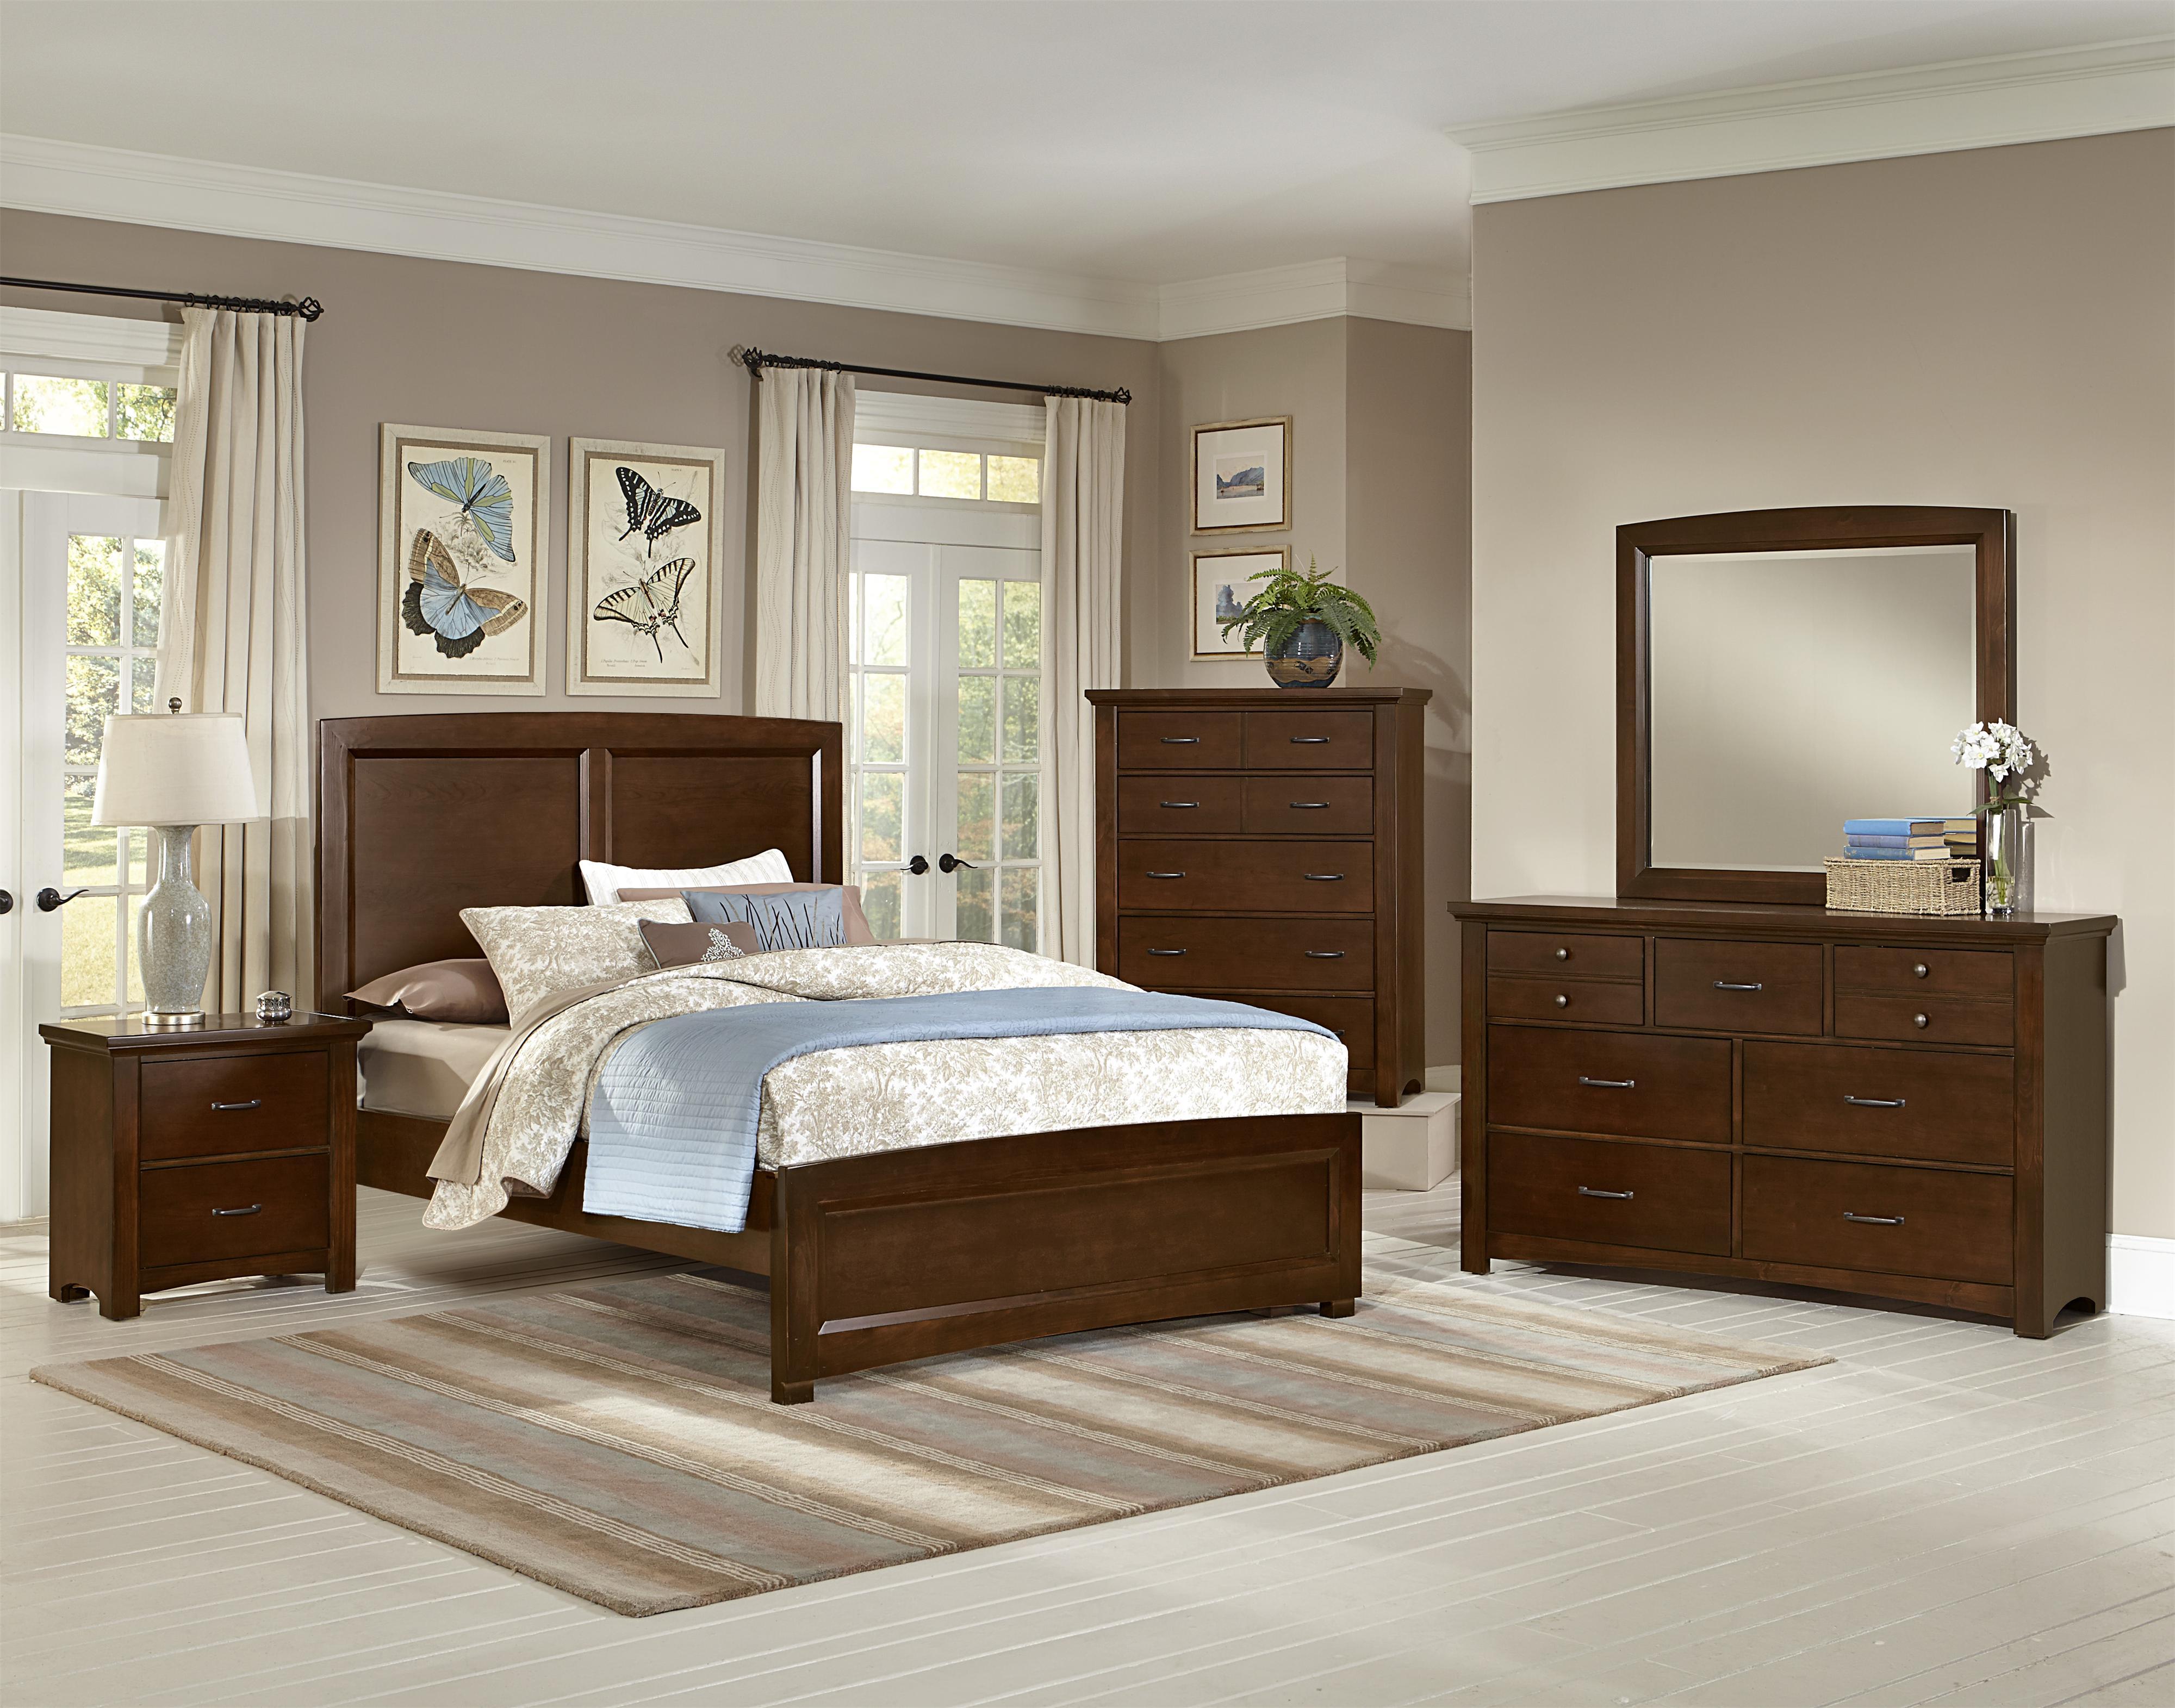 vaughan bassett transitions queen bedroom group belfort furniture bedroom groups. Black Bedroom Furniture Sets. Home Design Ideas